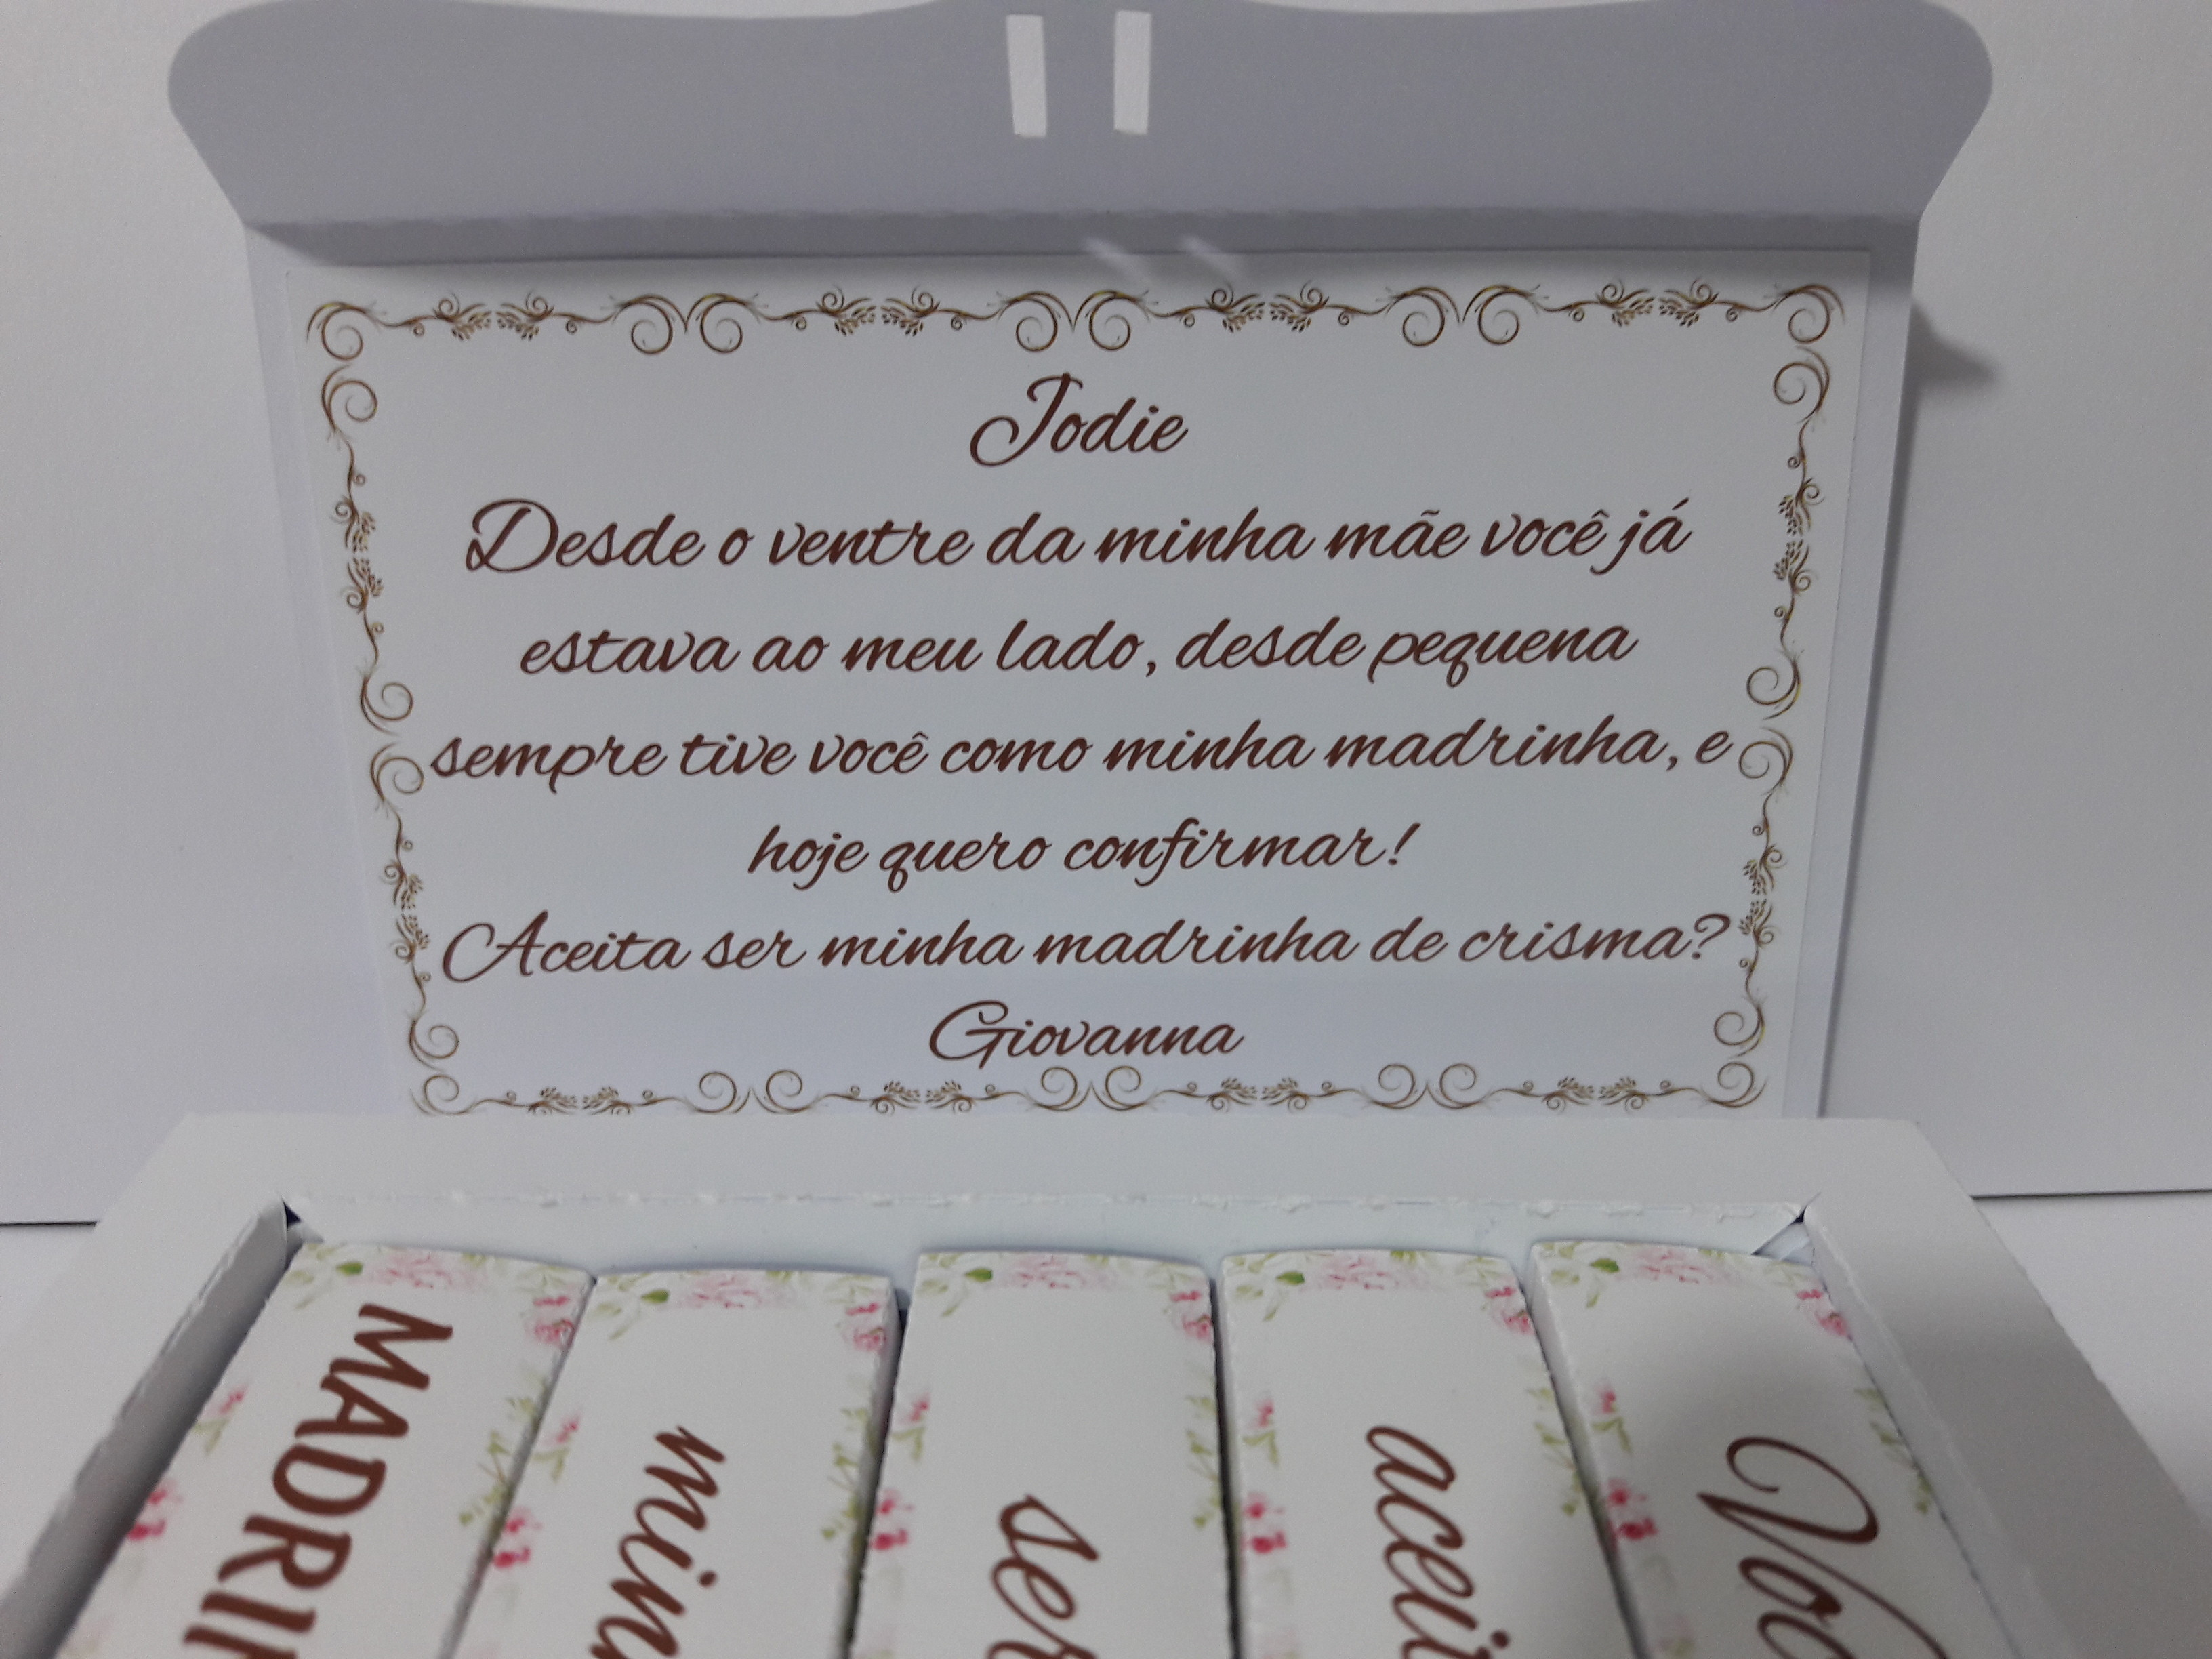 Caixa Convite para Madrinha de Crisma no Elo7   Di Bambinni (D40F99) b95f643cf6